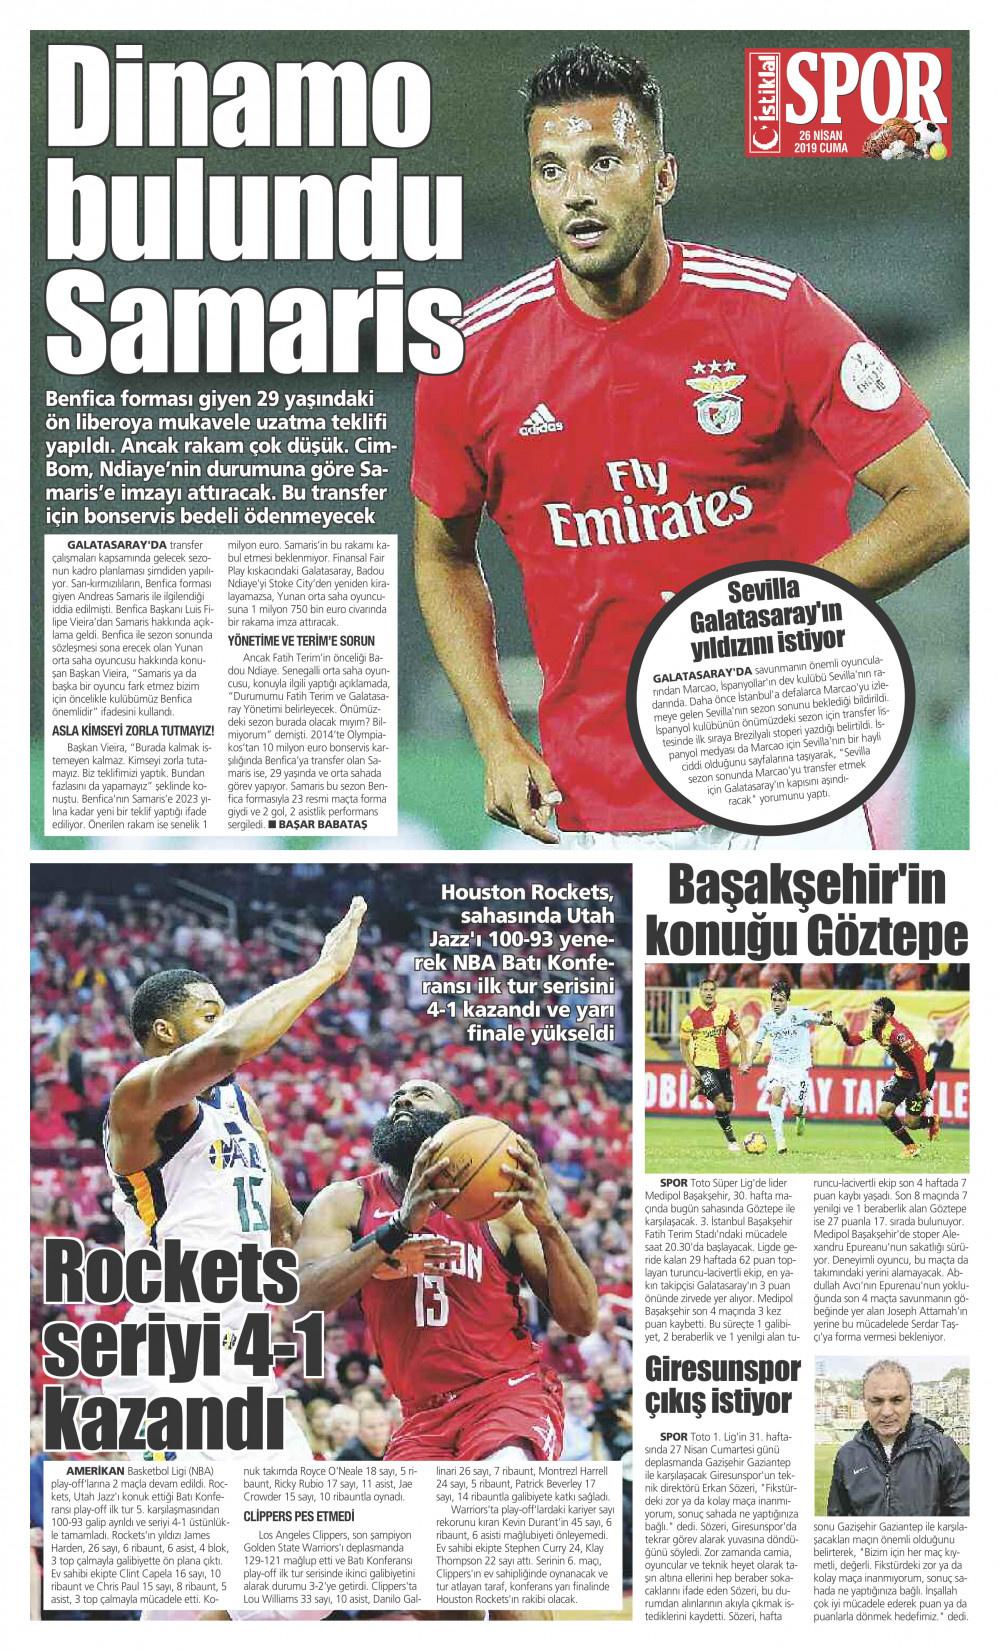 İstiklal Gazetesi 7'nci Sayfa